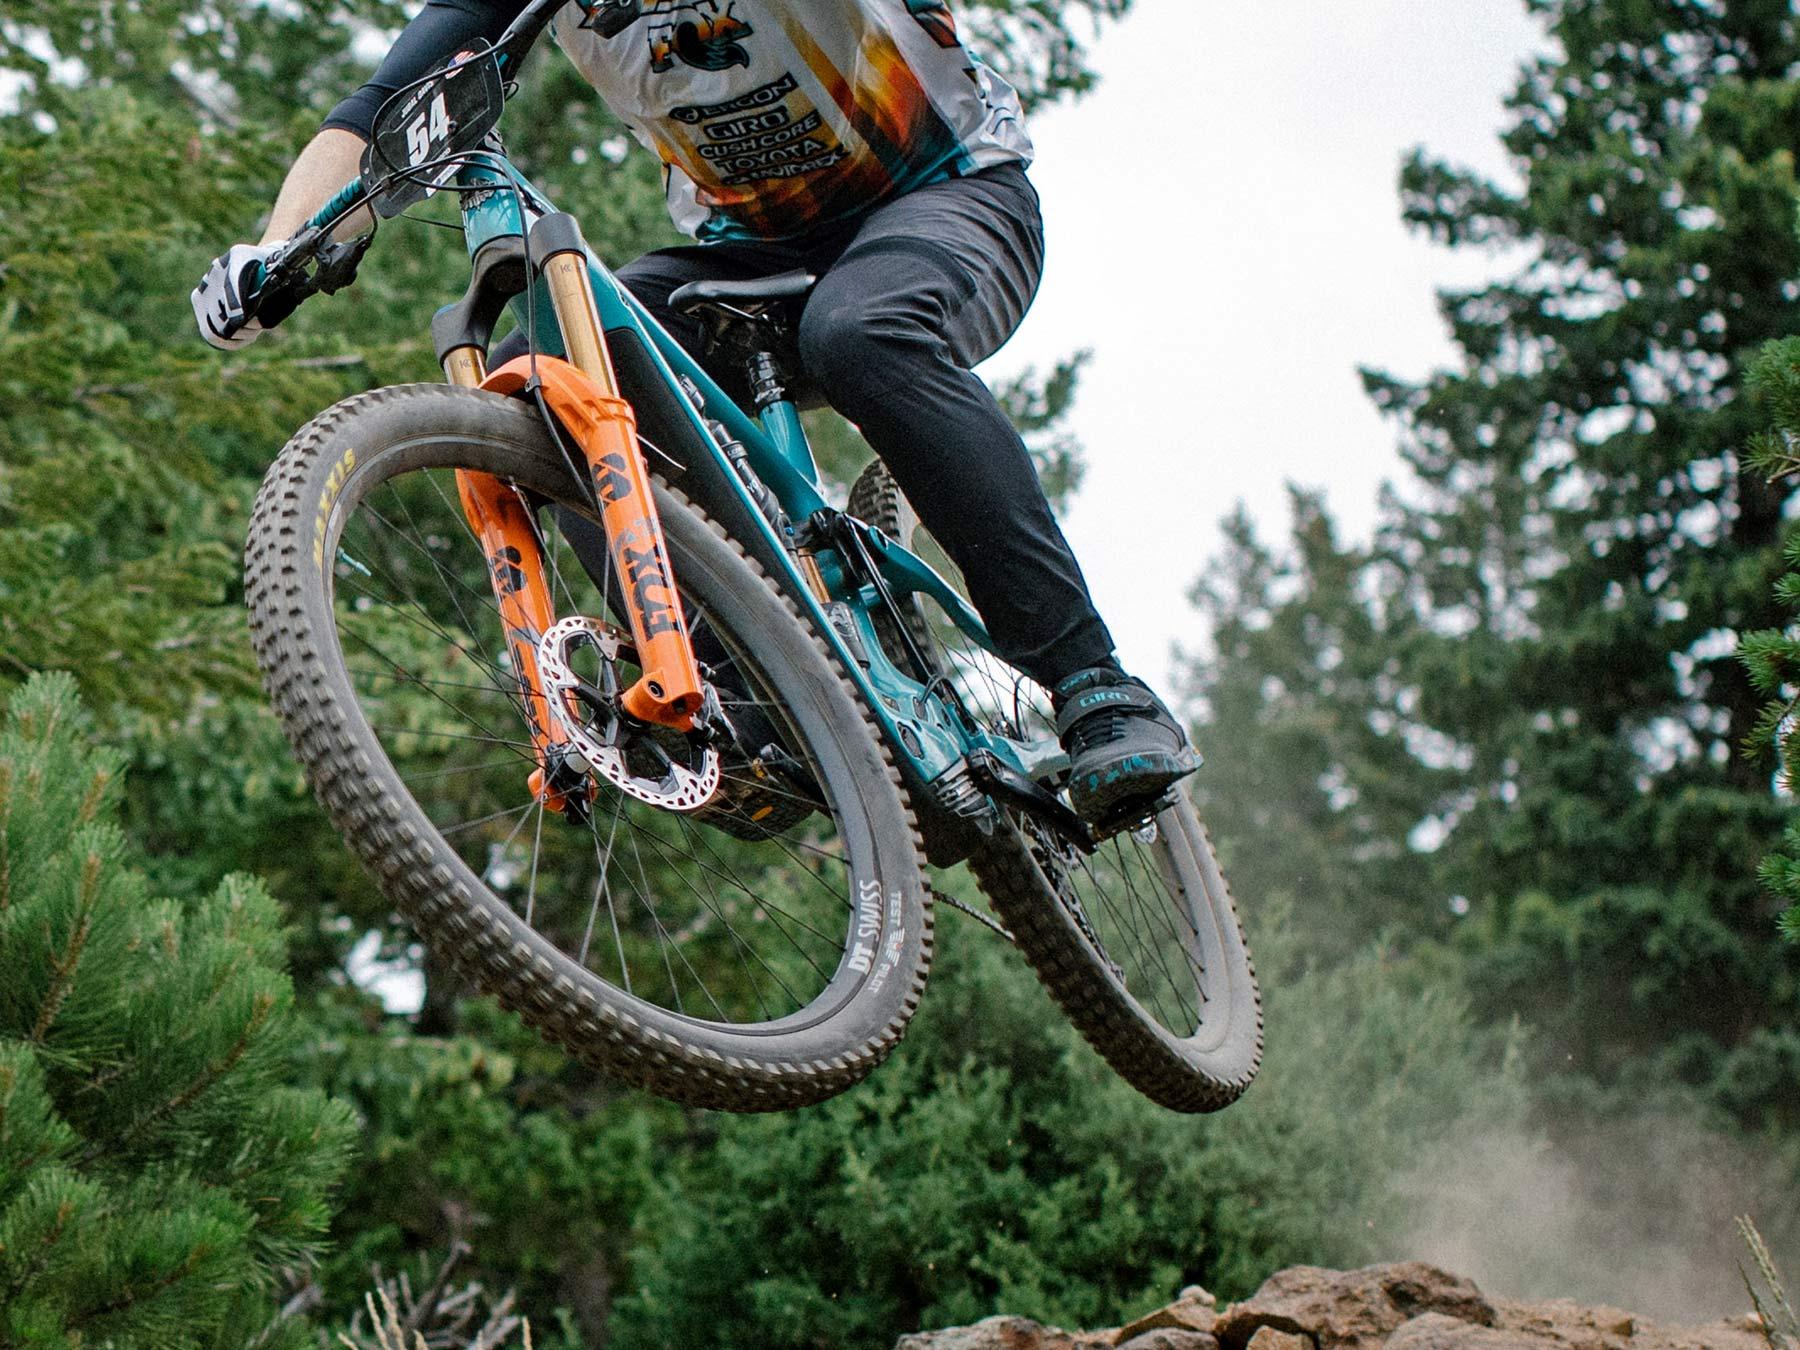 Yeti 160E EWS racing e-bike, all-new 6-bar suspension carbon 160mm eMTB,Jared Graves jump